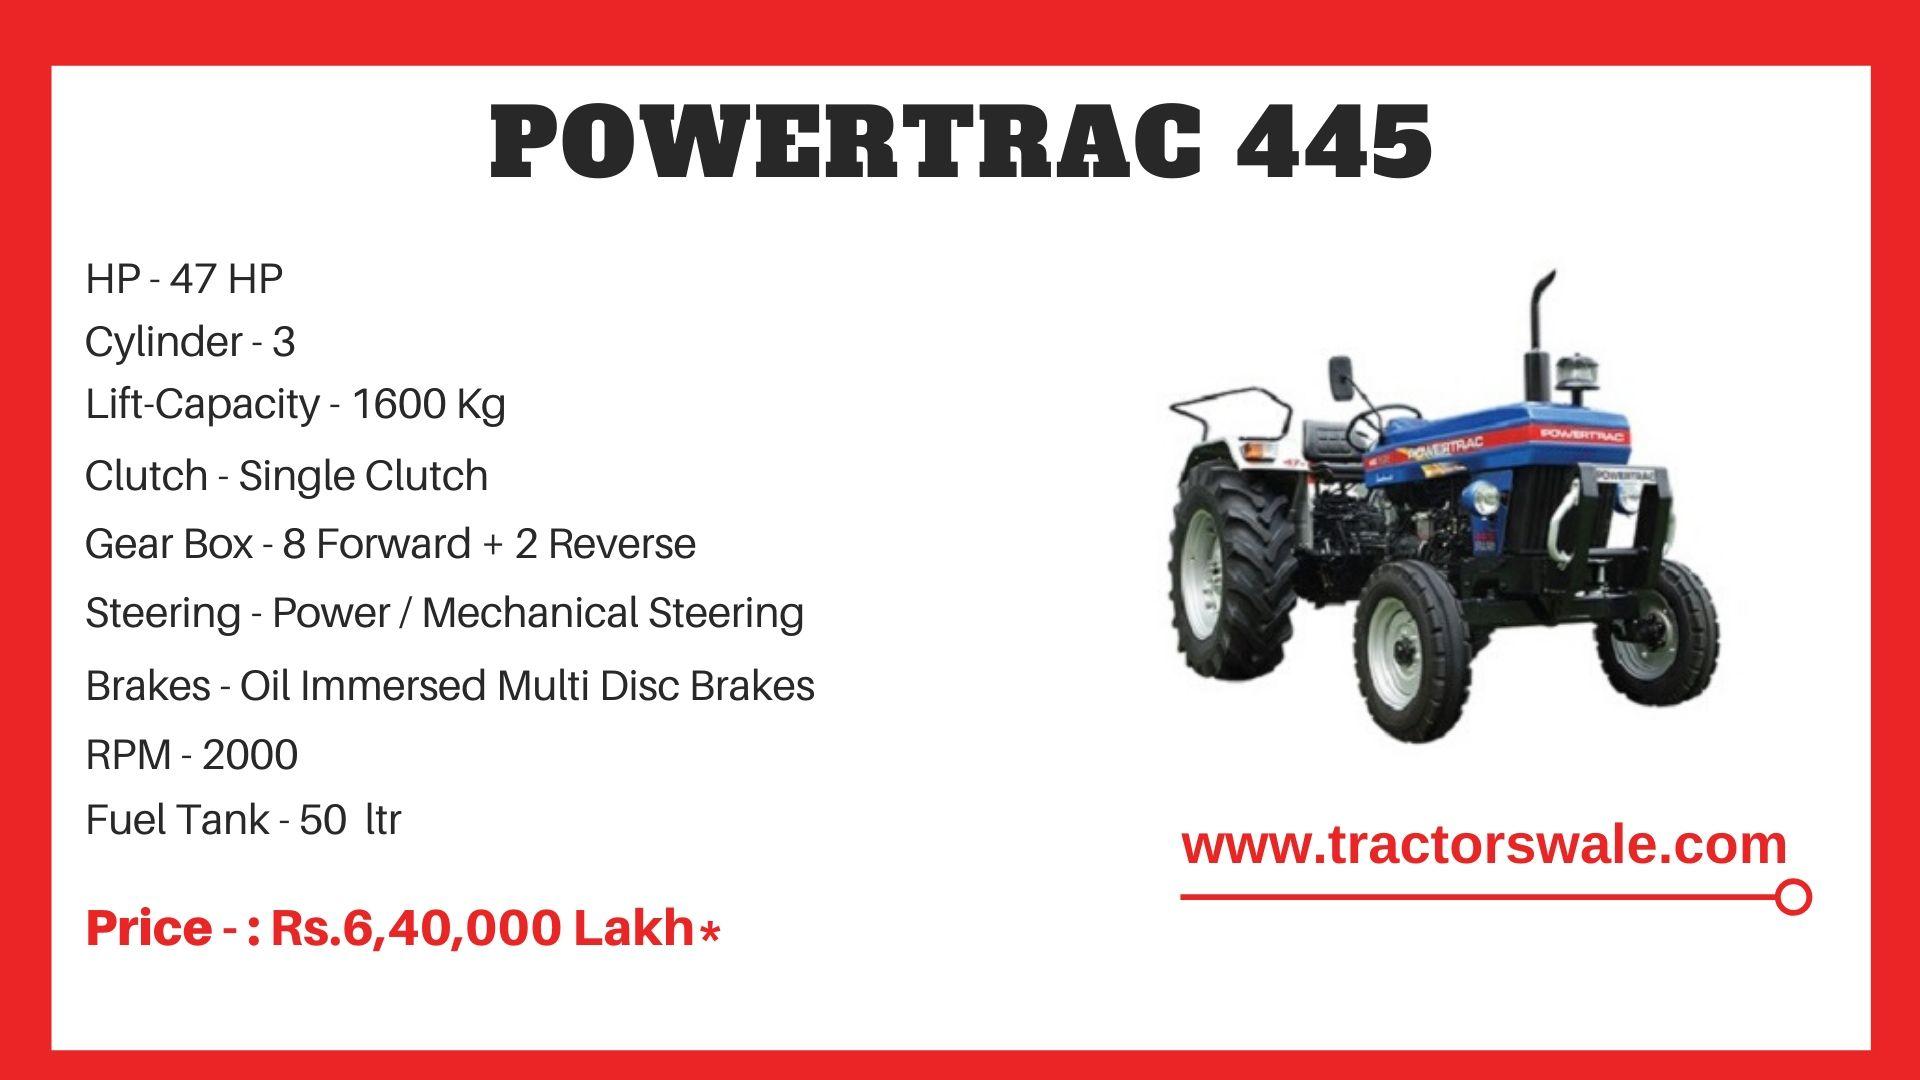 PowerTrac 445 tractor price